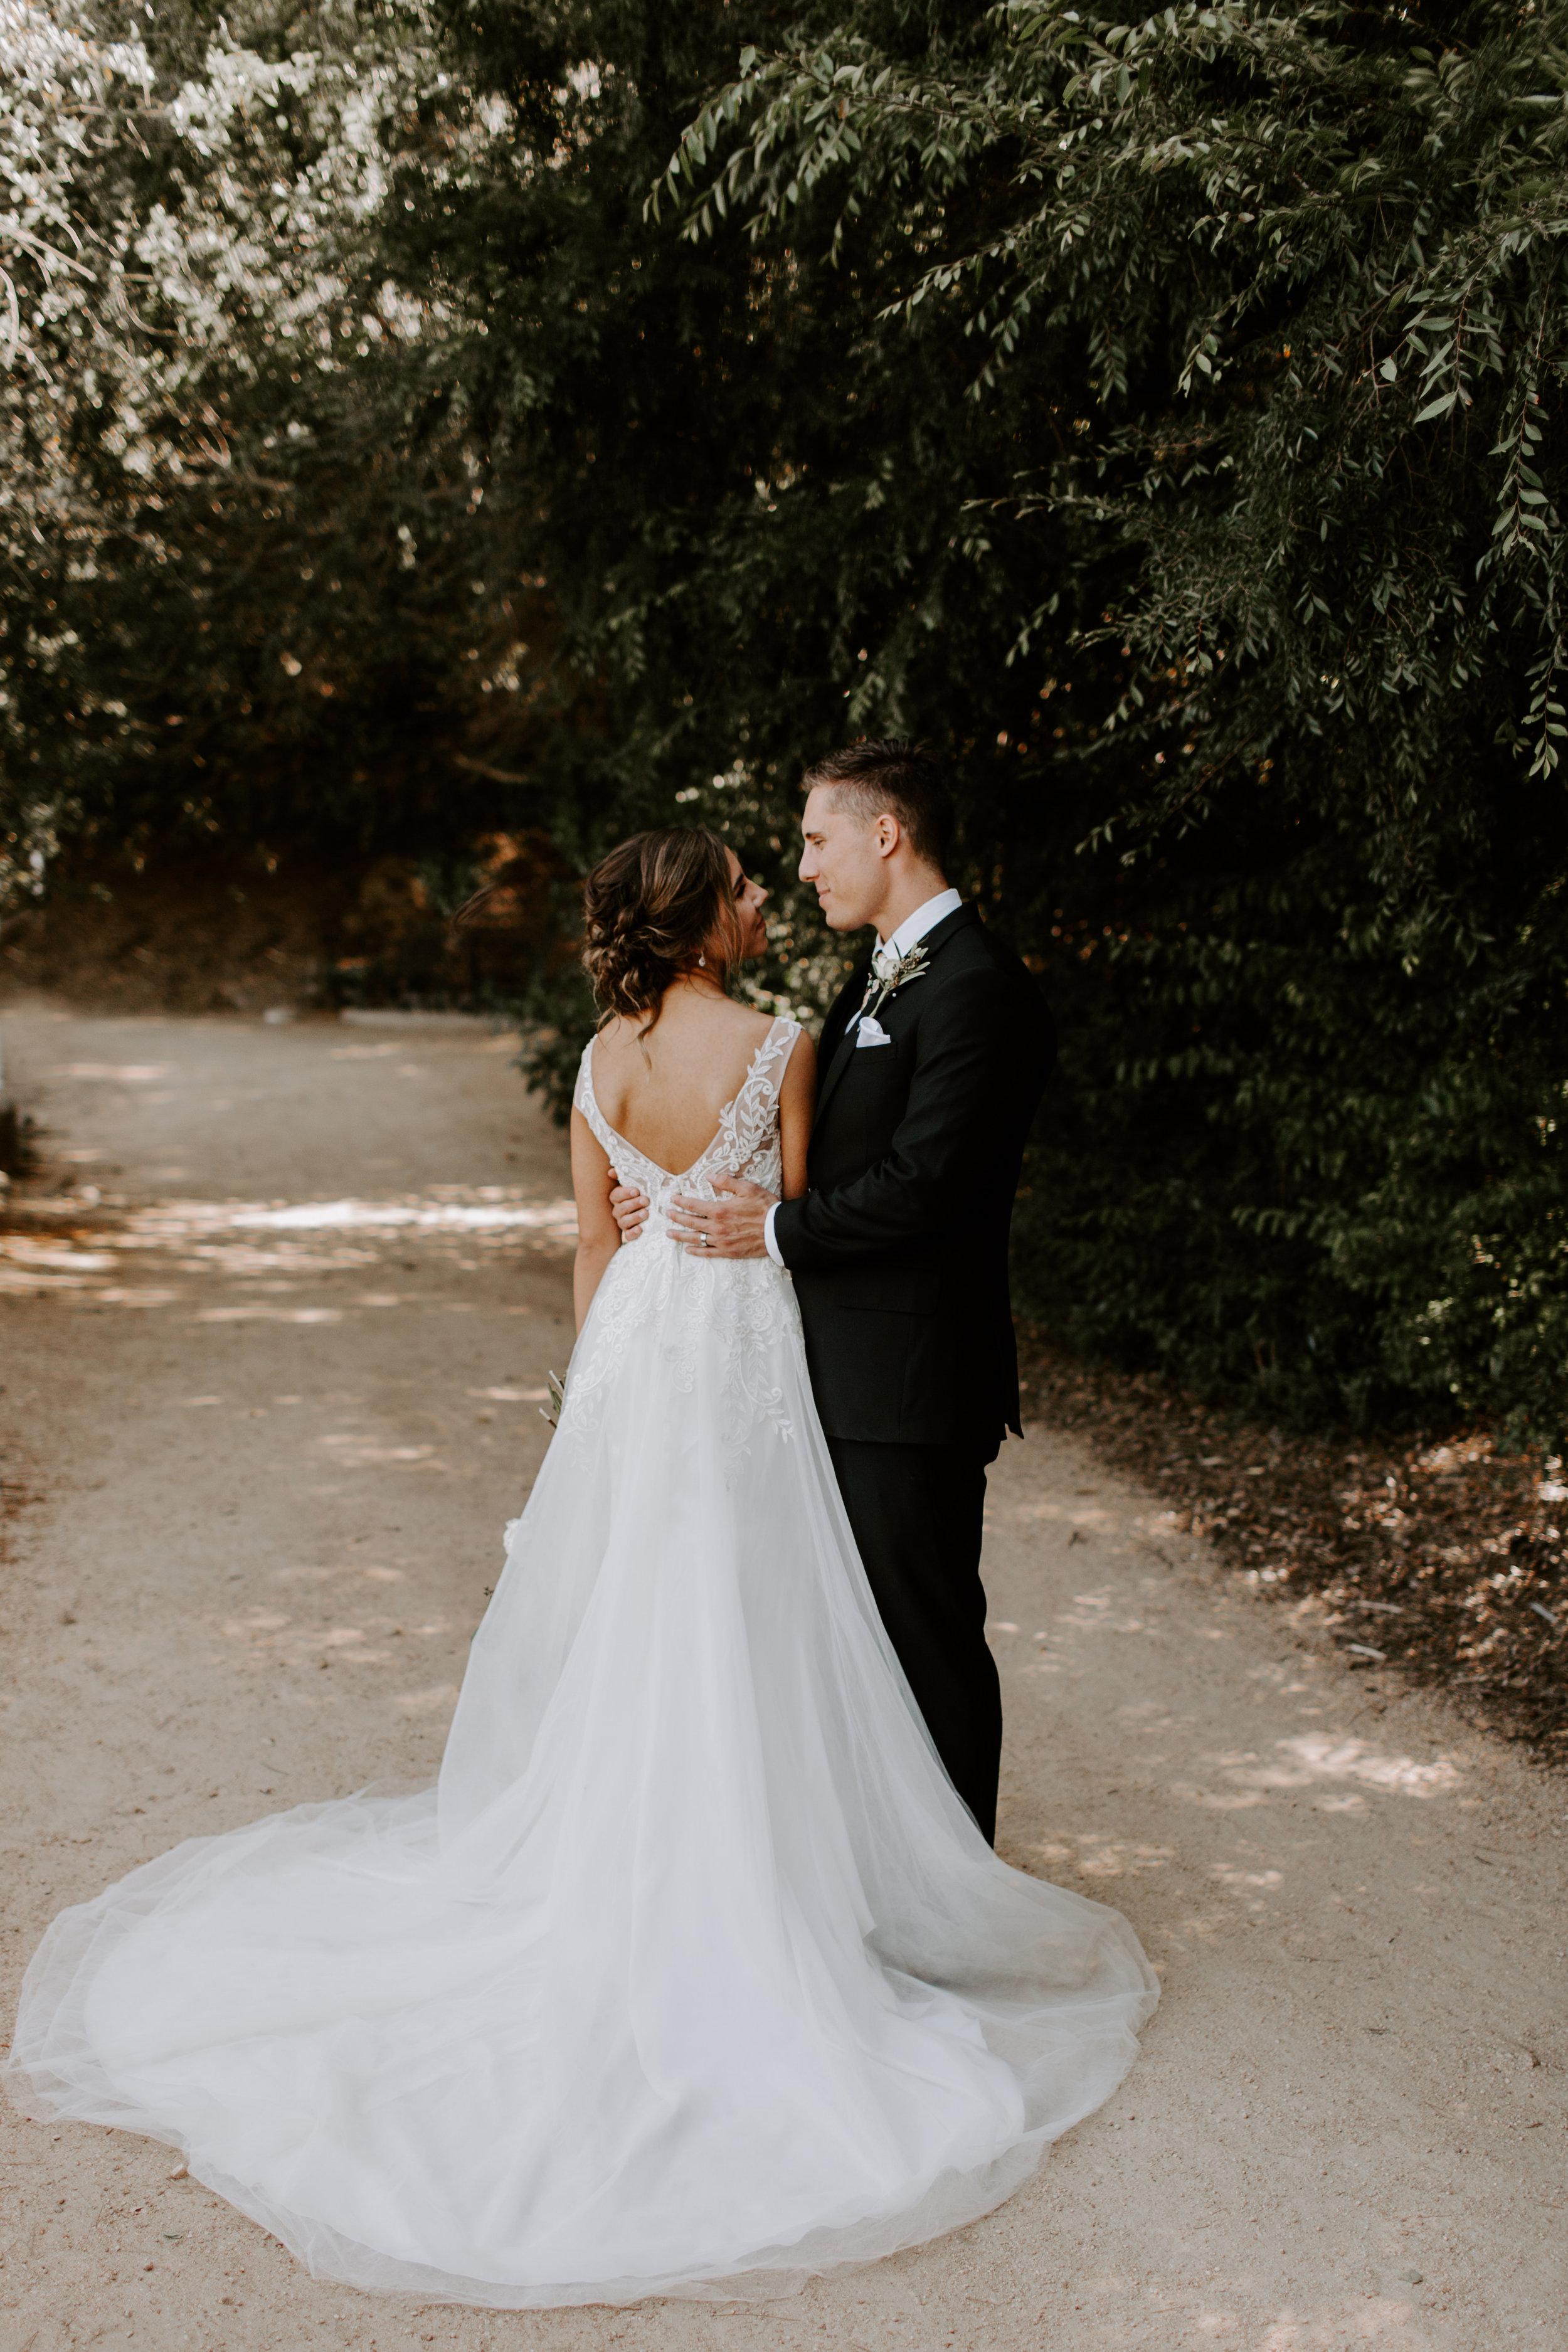 kate+zack_wedding_secludedgardenestate_temecula_madisonrylee_0657.jpg